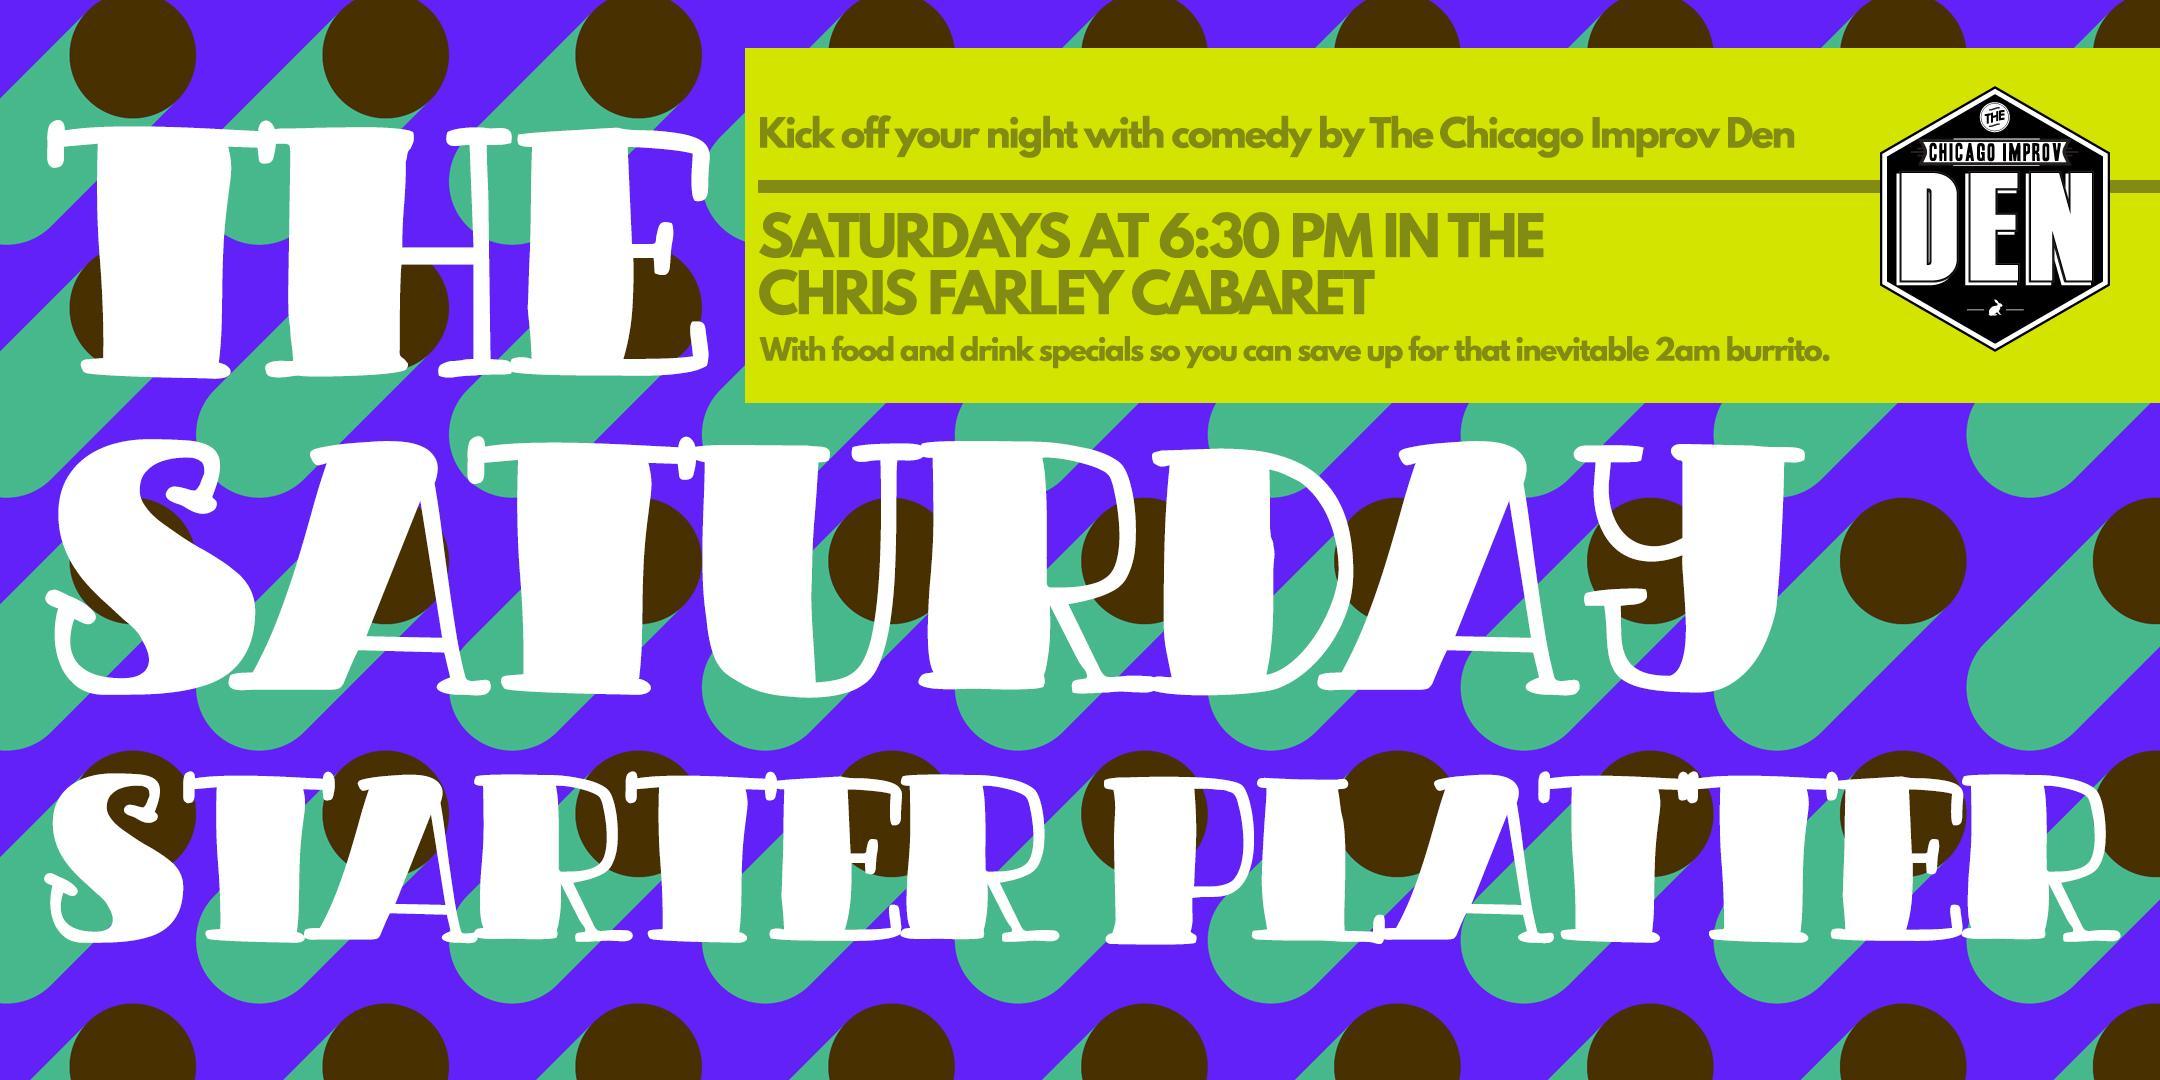 Saturday Starter Platter